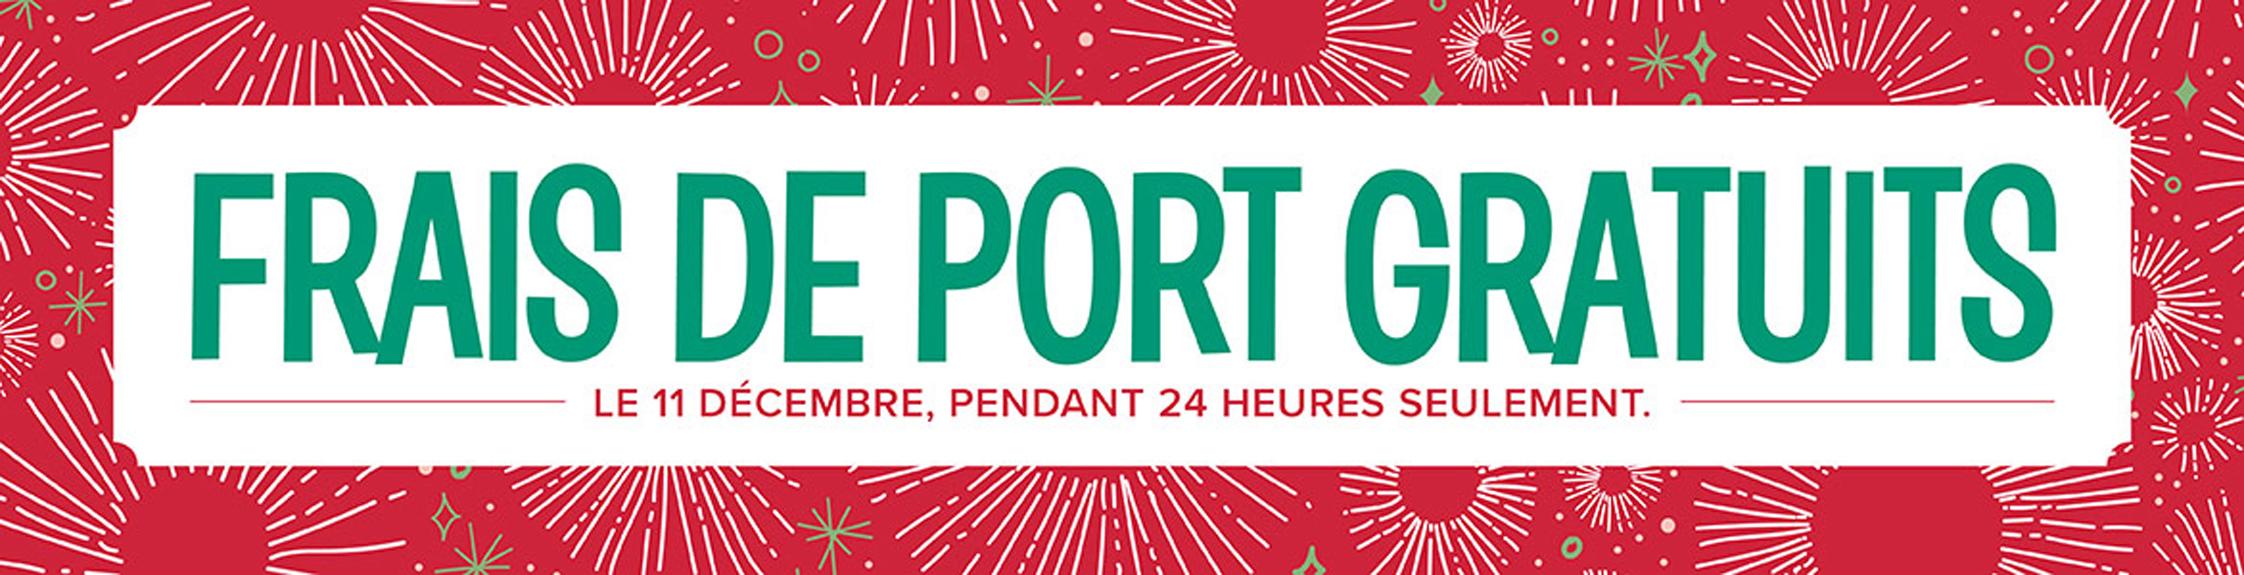 Code frais de port gratuit gallery of code promo bonprix fr with code frais de port gratuit - Code reduc cdiscount frais de port gratuit ...